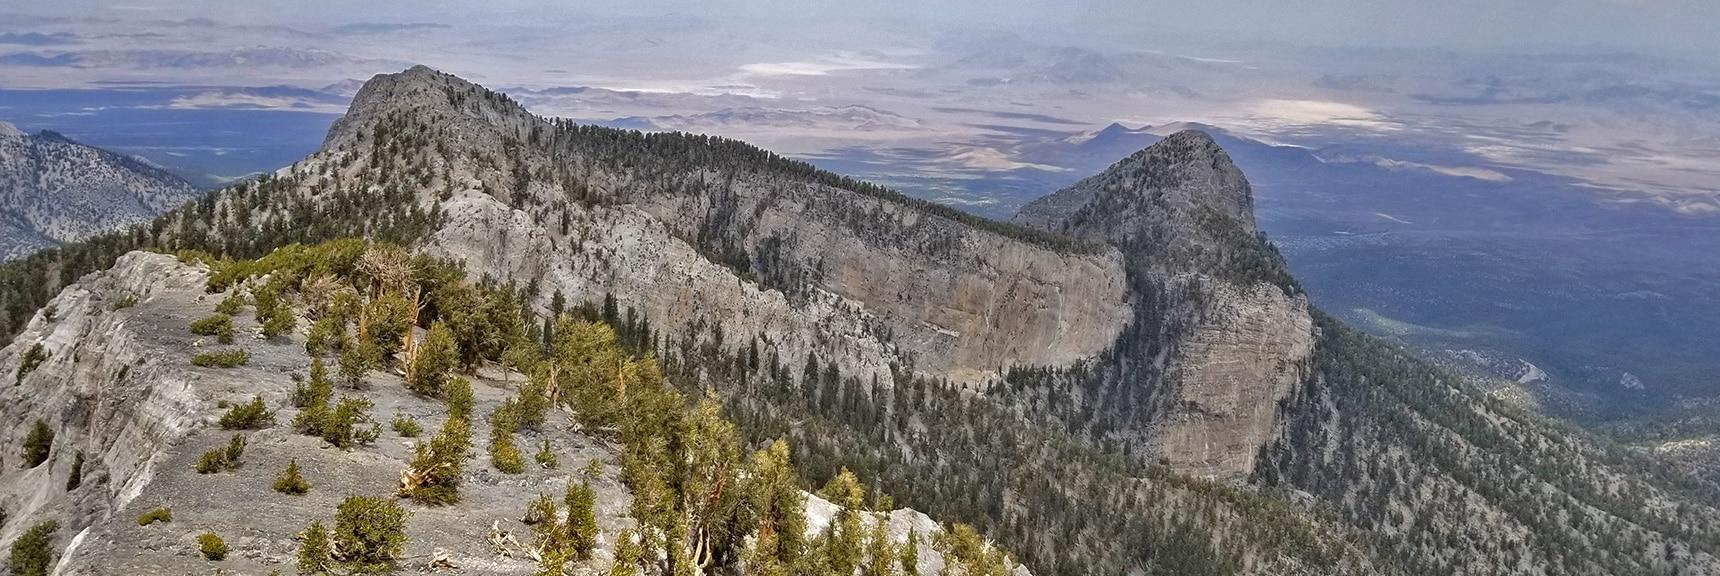 Mummy's Head from the Northern Rim Tip   Mummy Mountain Northern Rim Overlook, Spring Mountain Wilderness, Nevada